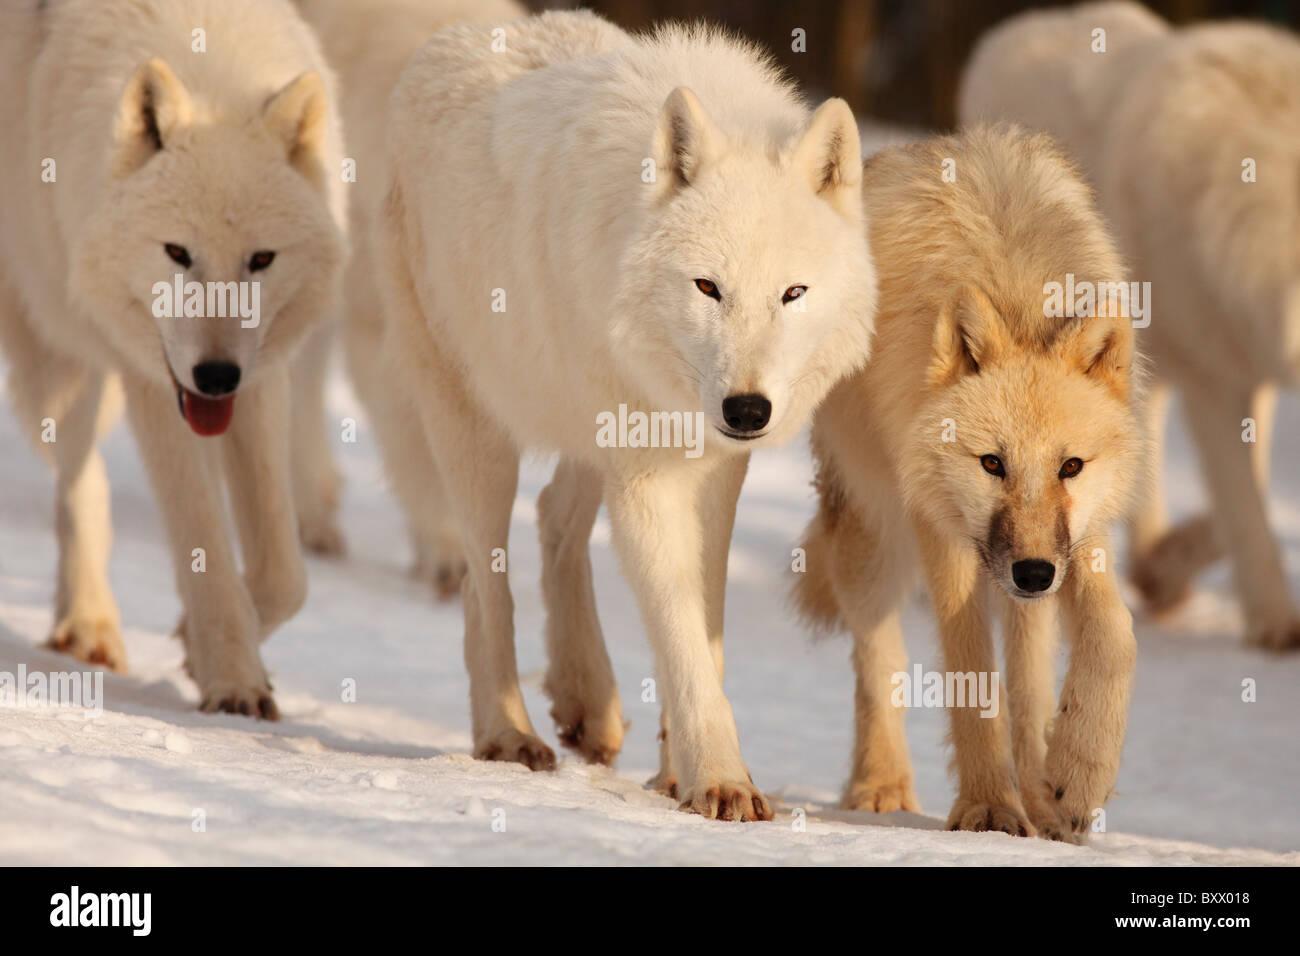 Arctic Wolves; Canis lupus arctos - Stock Image